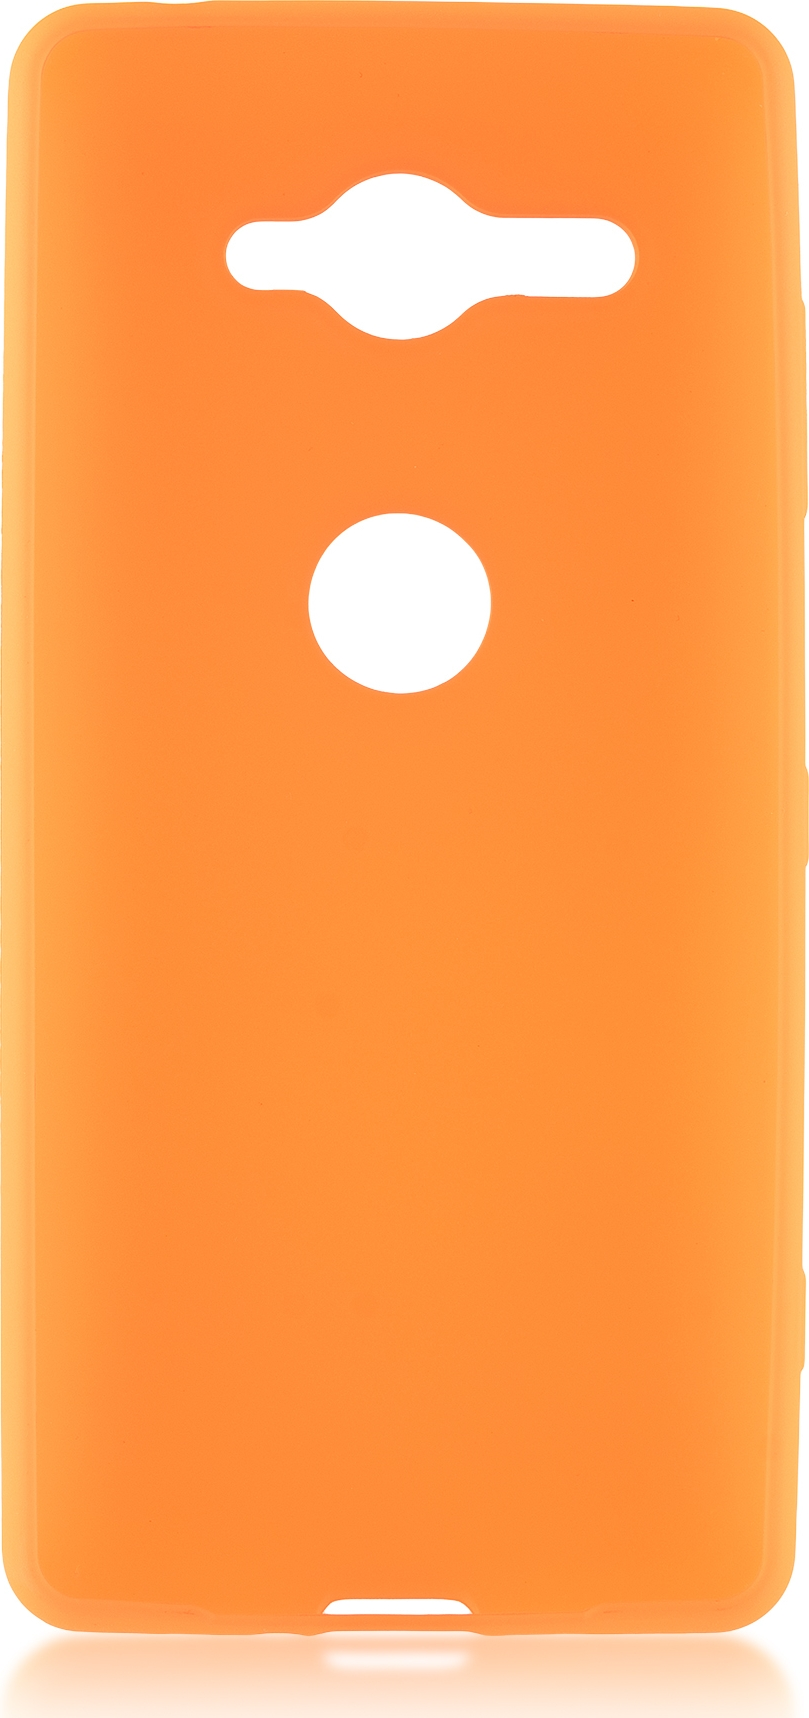 Чехол Brosco Colourful для Sony Xperia XZ2 Compact, оранжевый аксессуар чехол для sony xperia xz2 compact brosco transparent xz2c tpu transparent